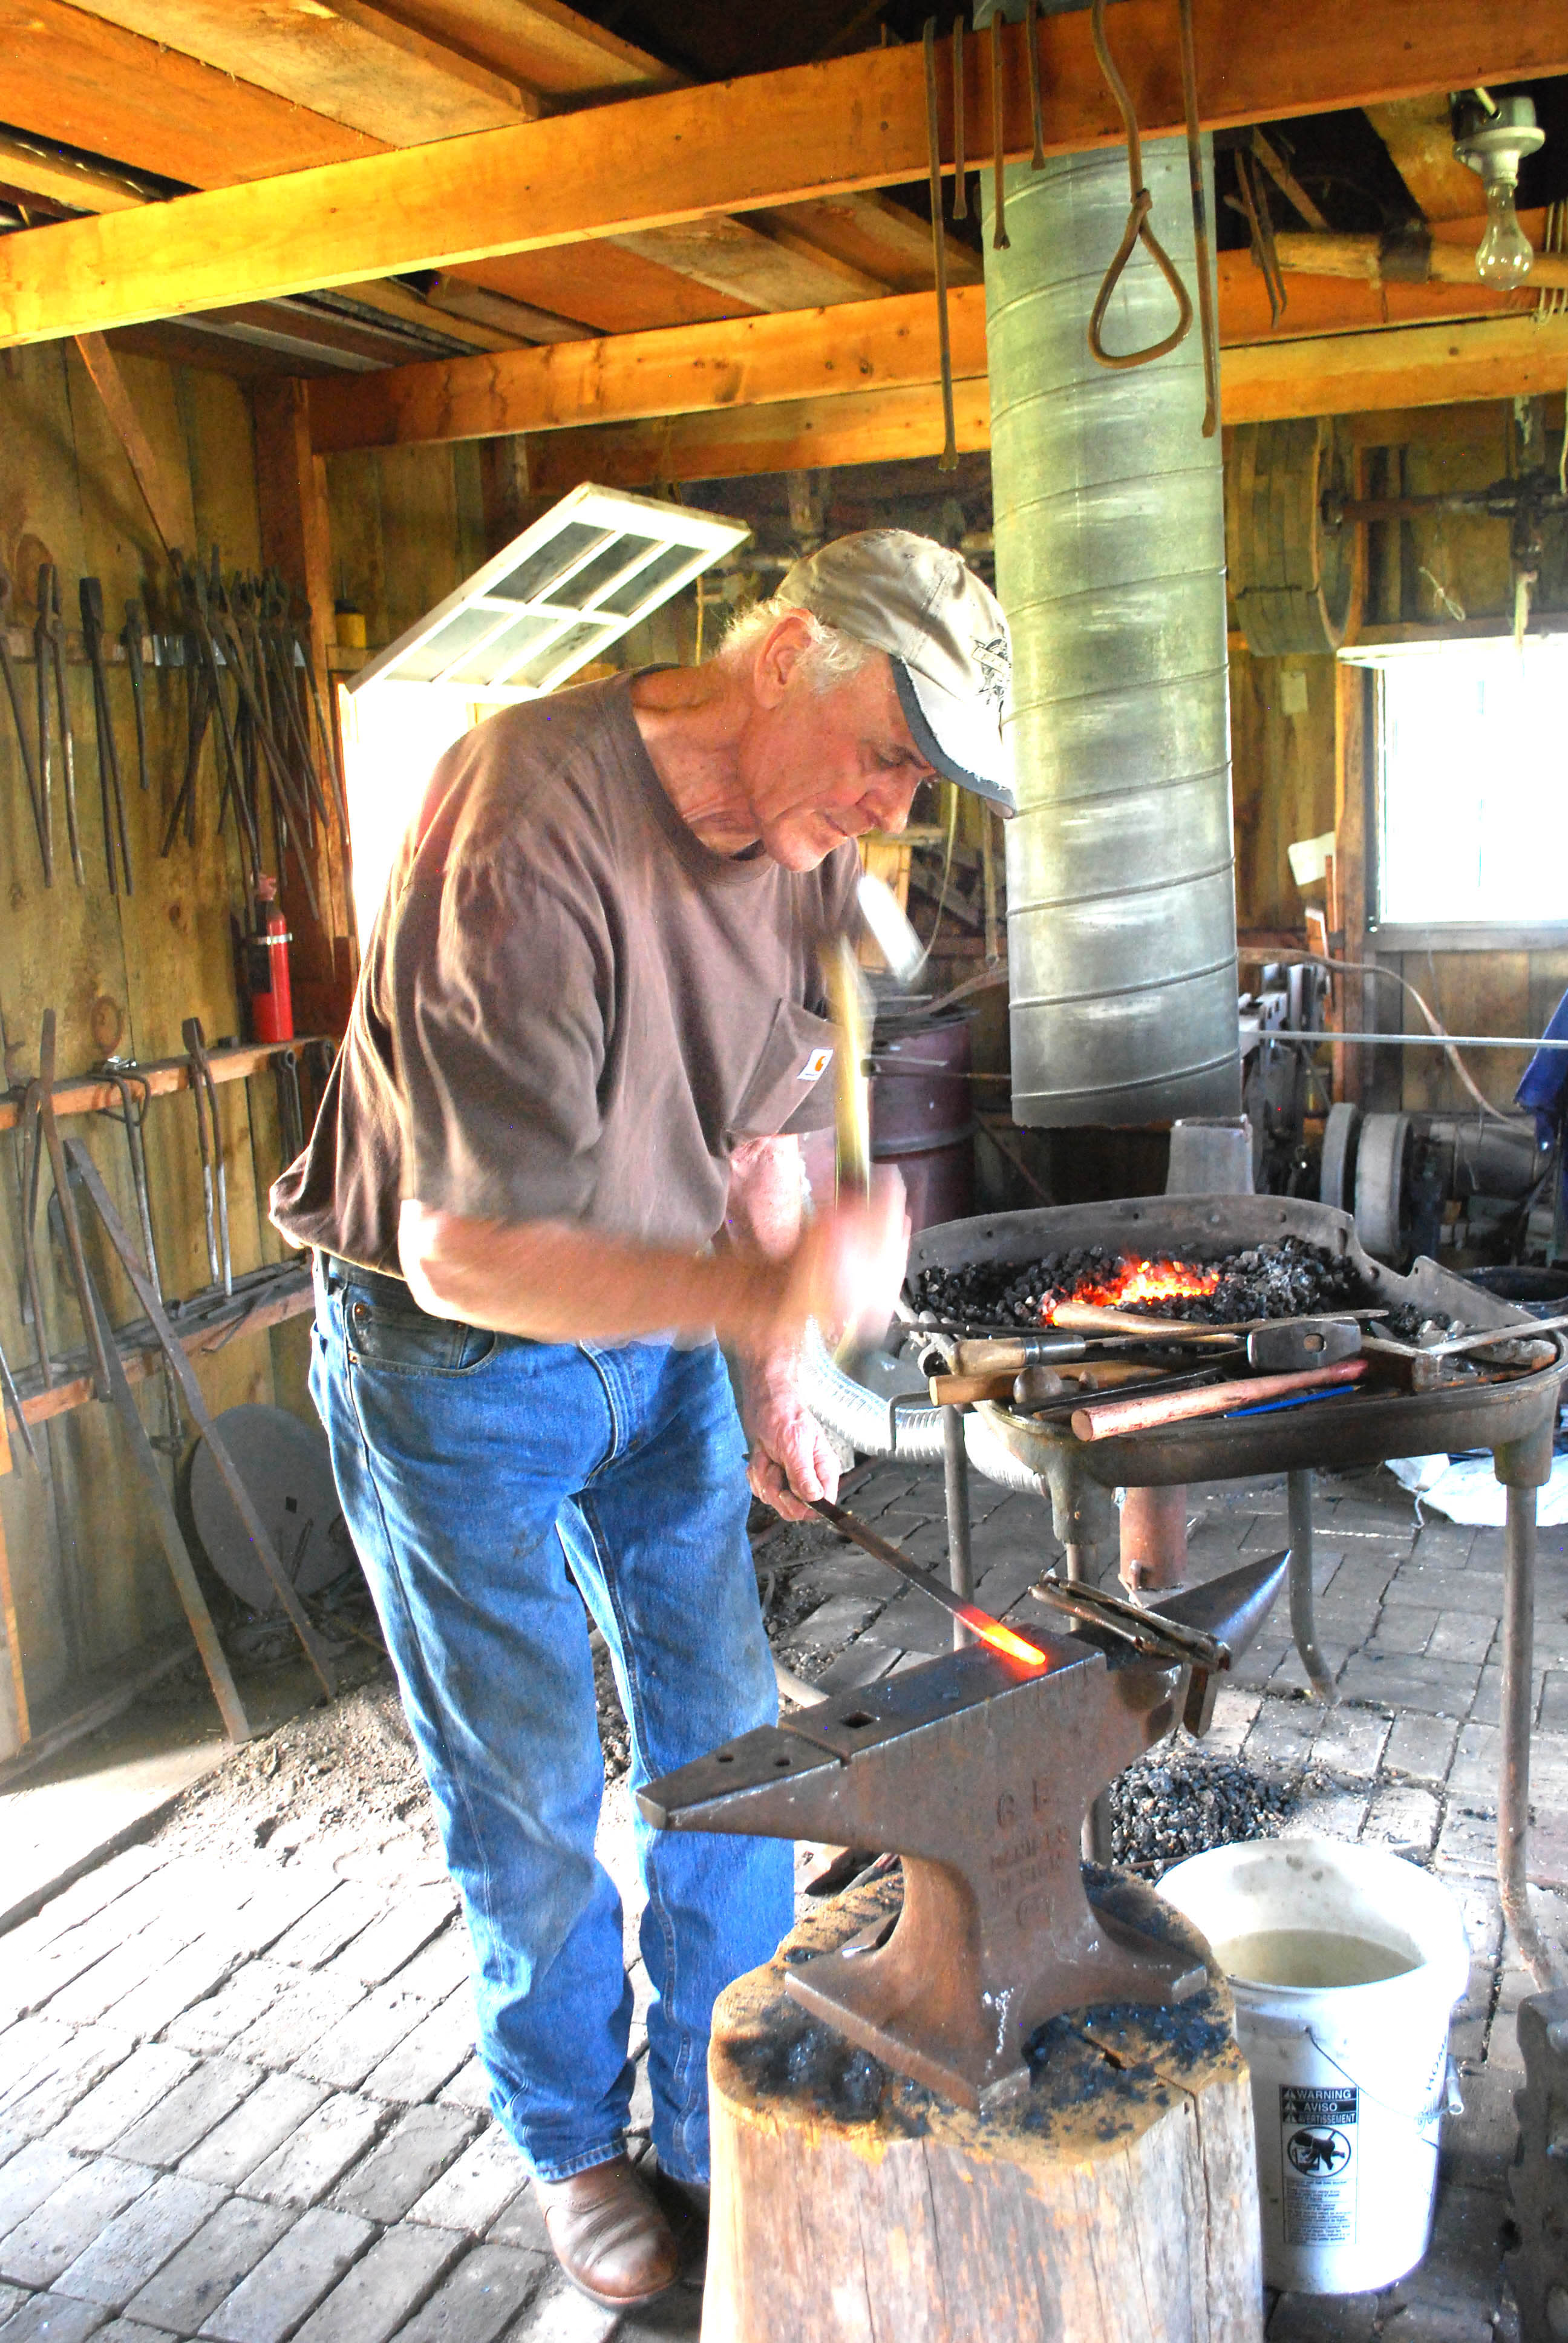 Caption: Randy Oberg of Grand rapids, MN - Professional Blacksmith